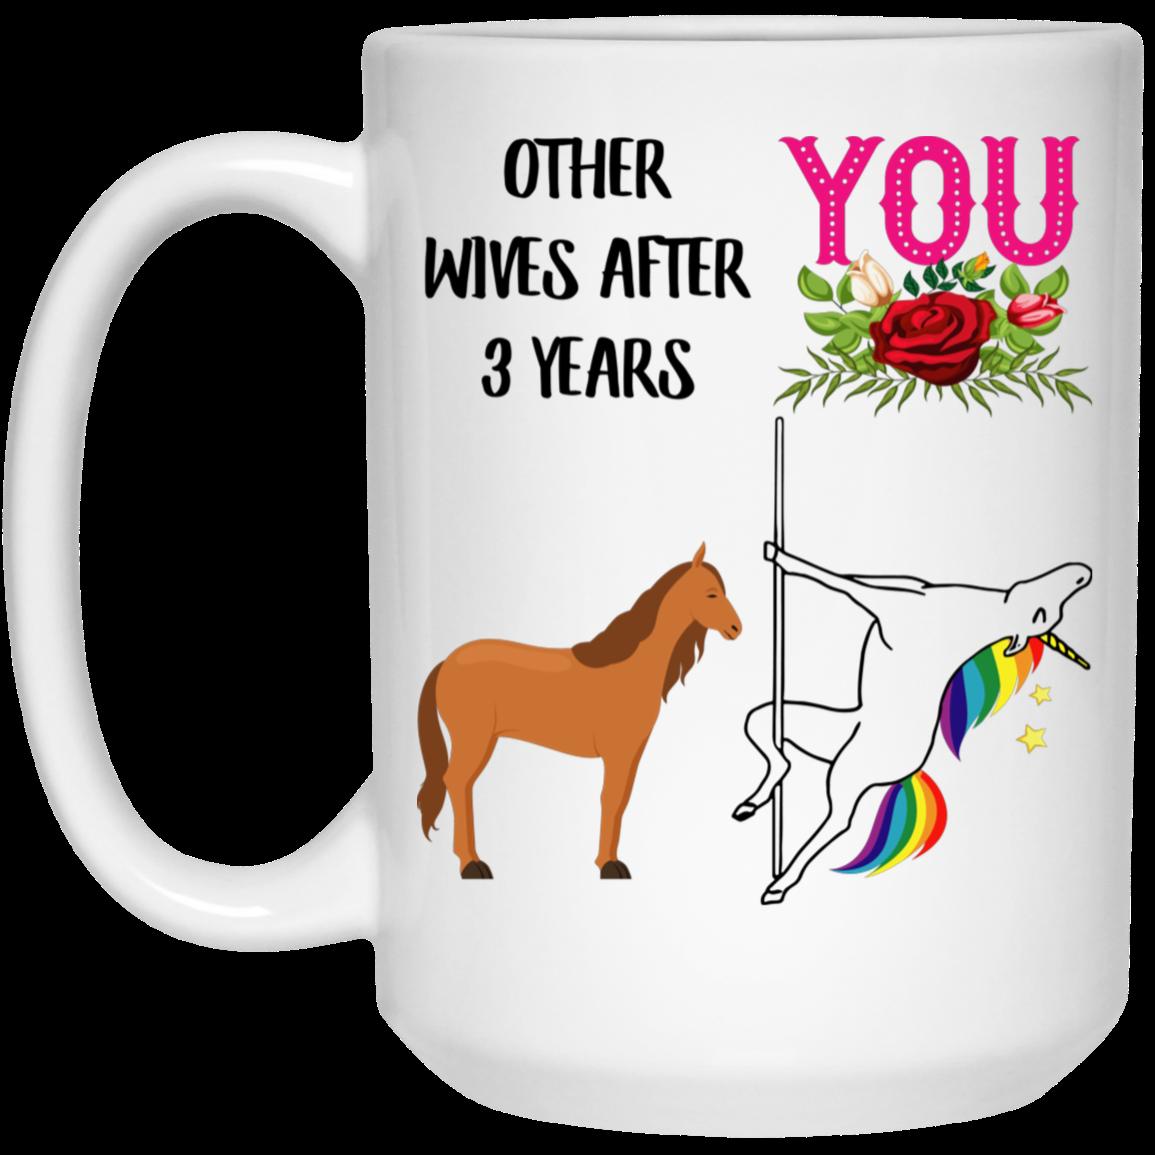 3 Year Anniversary Gift For Wife Mug Anniversary gifts